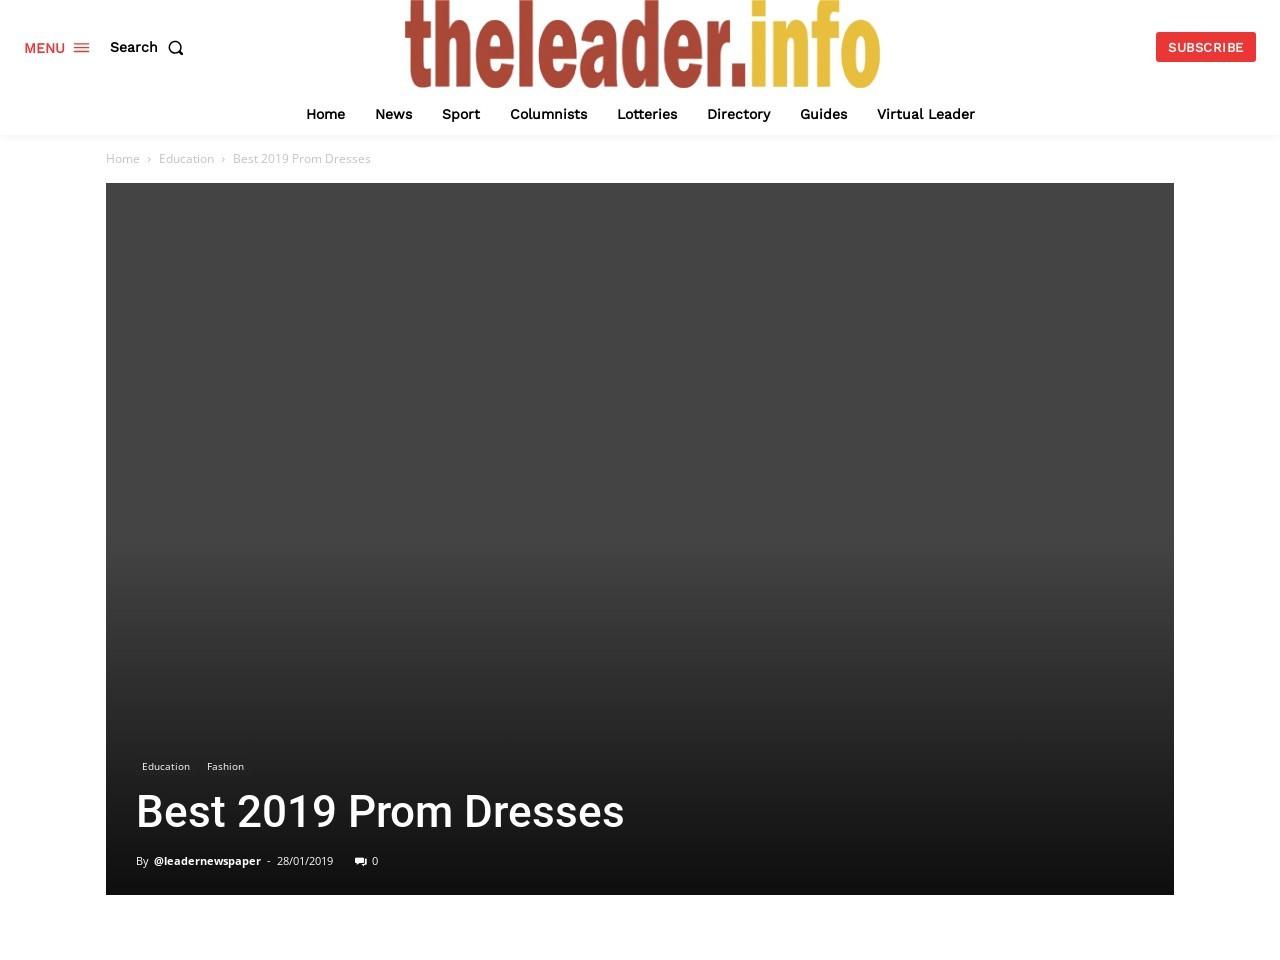 Best 2019 Prom Dresses